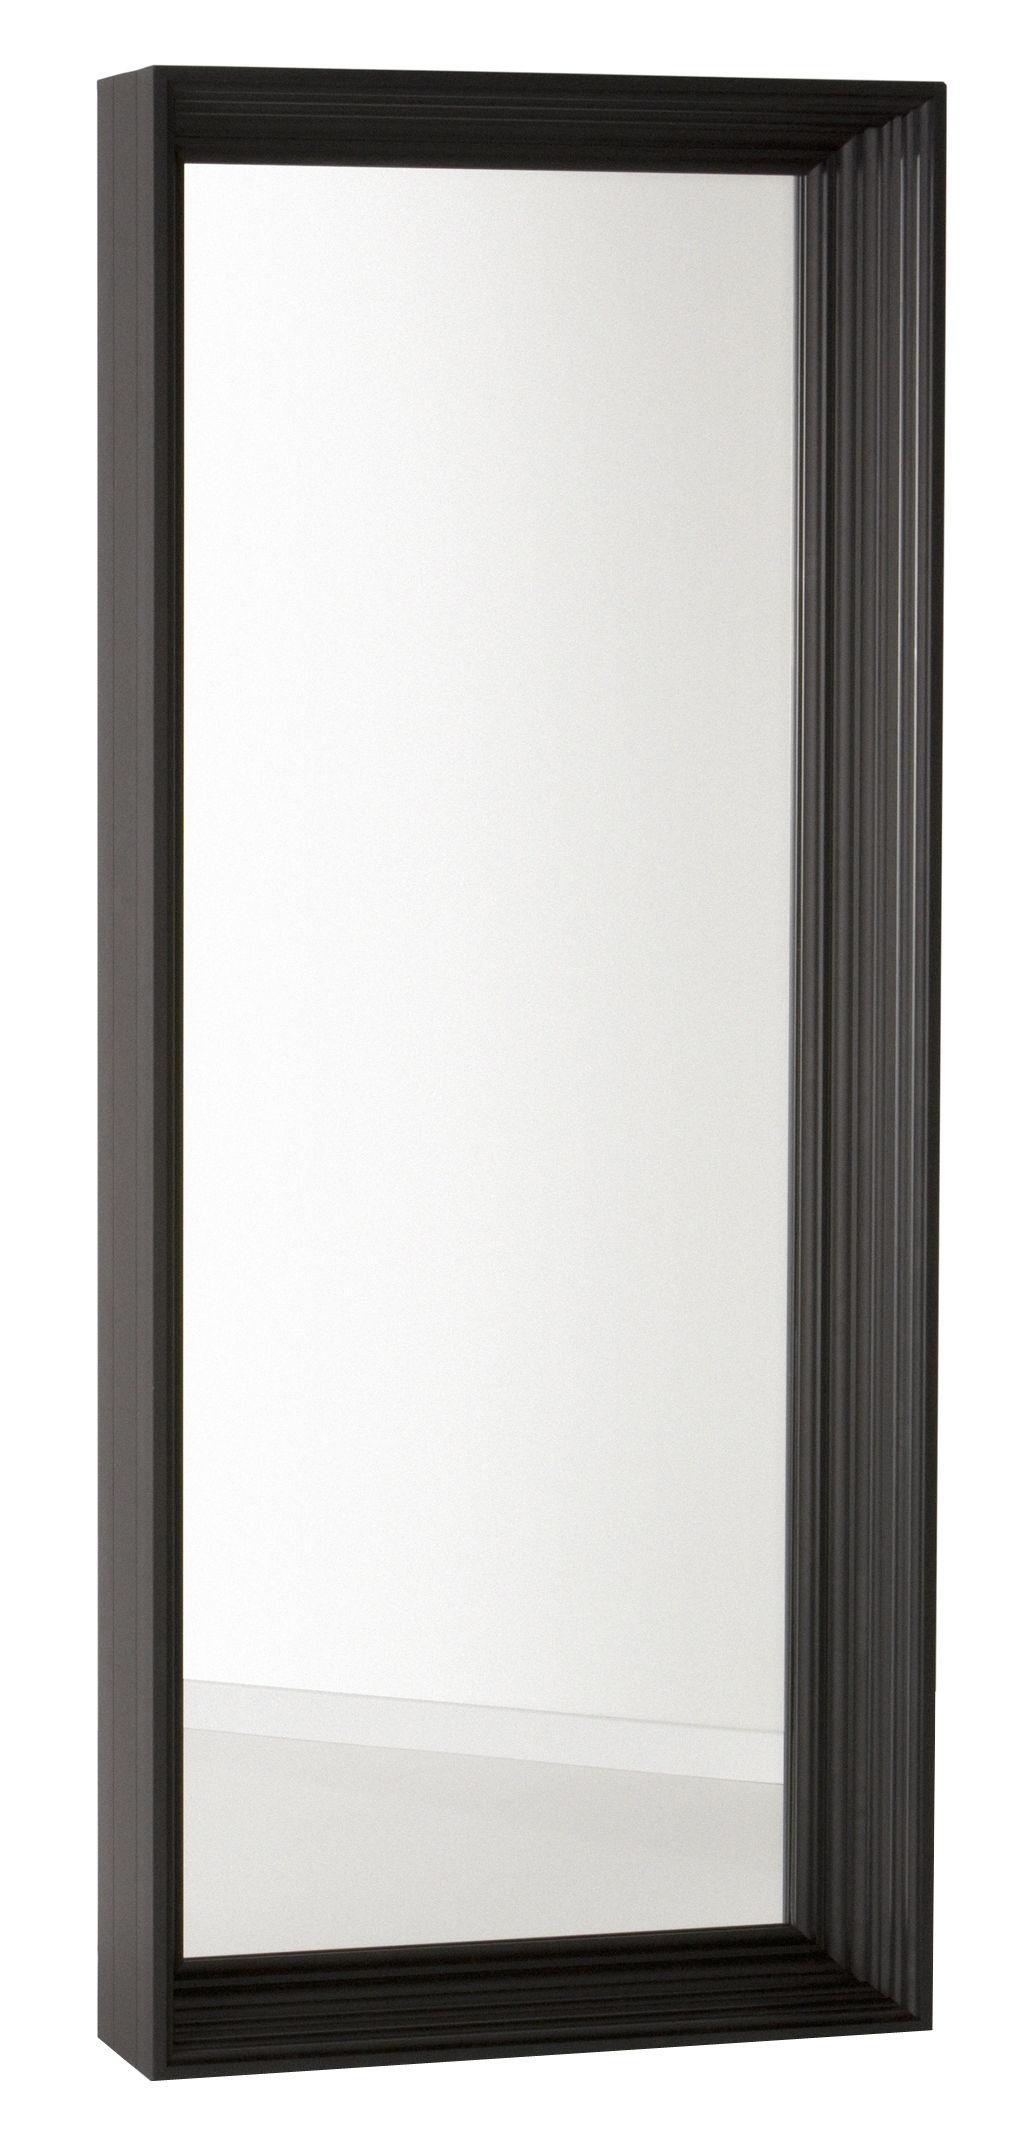 Miroir frame l 180 cm noir moooi for Miroir 180 cm